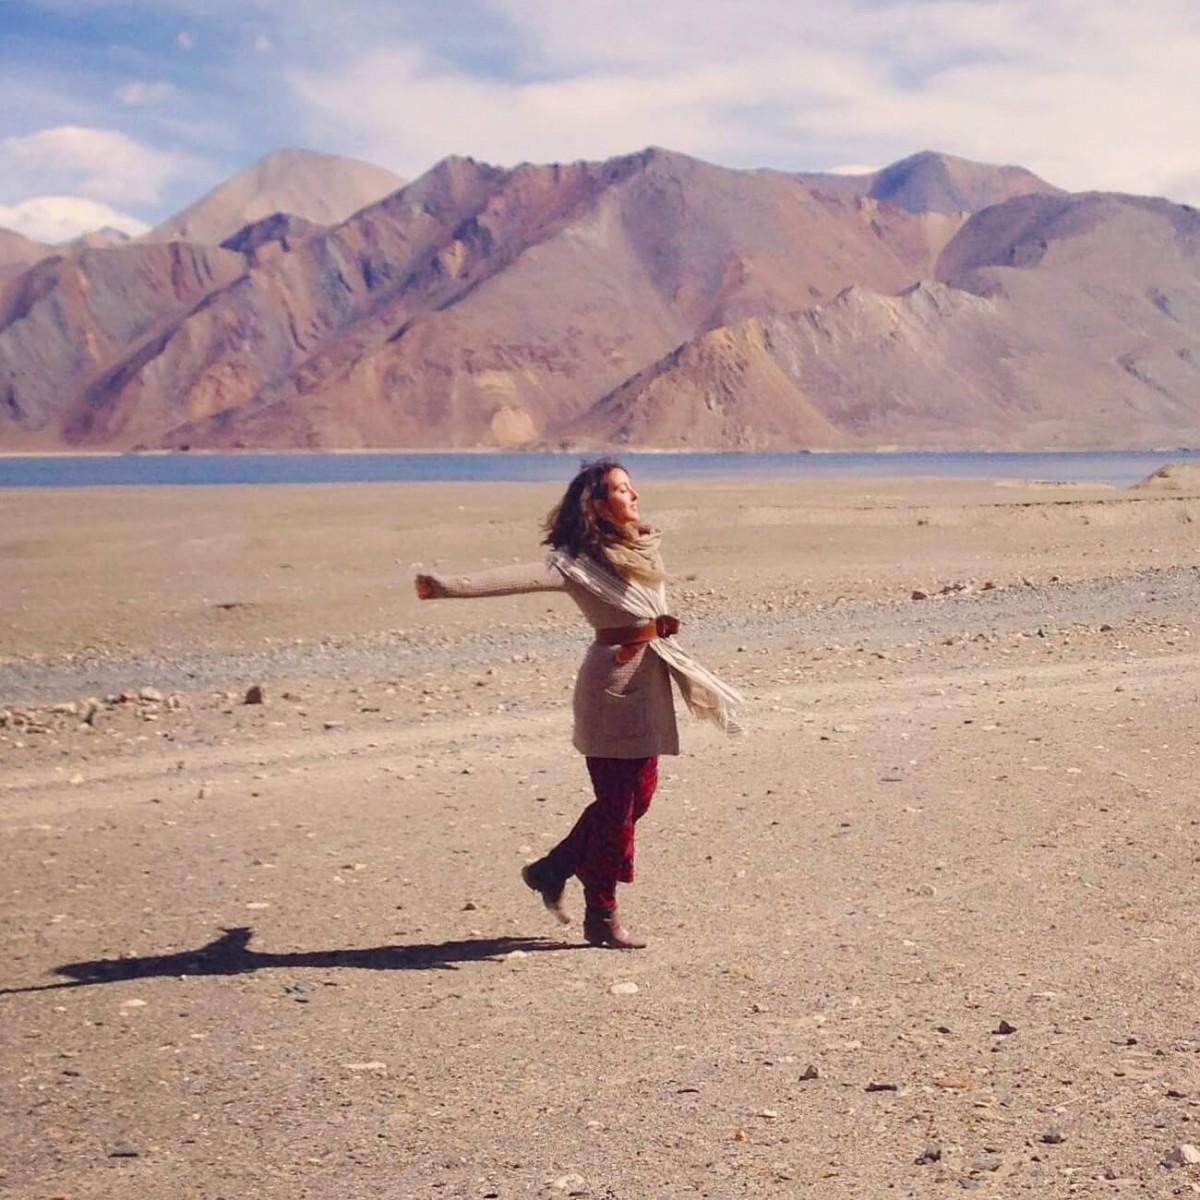 Carina jumping in the desert